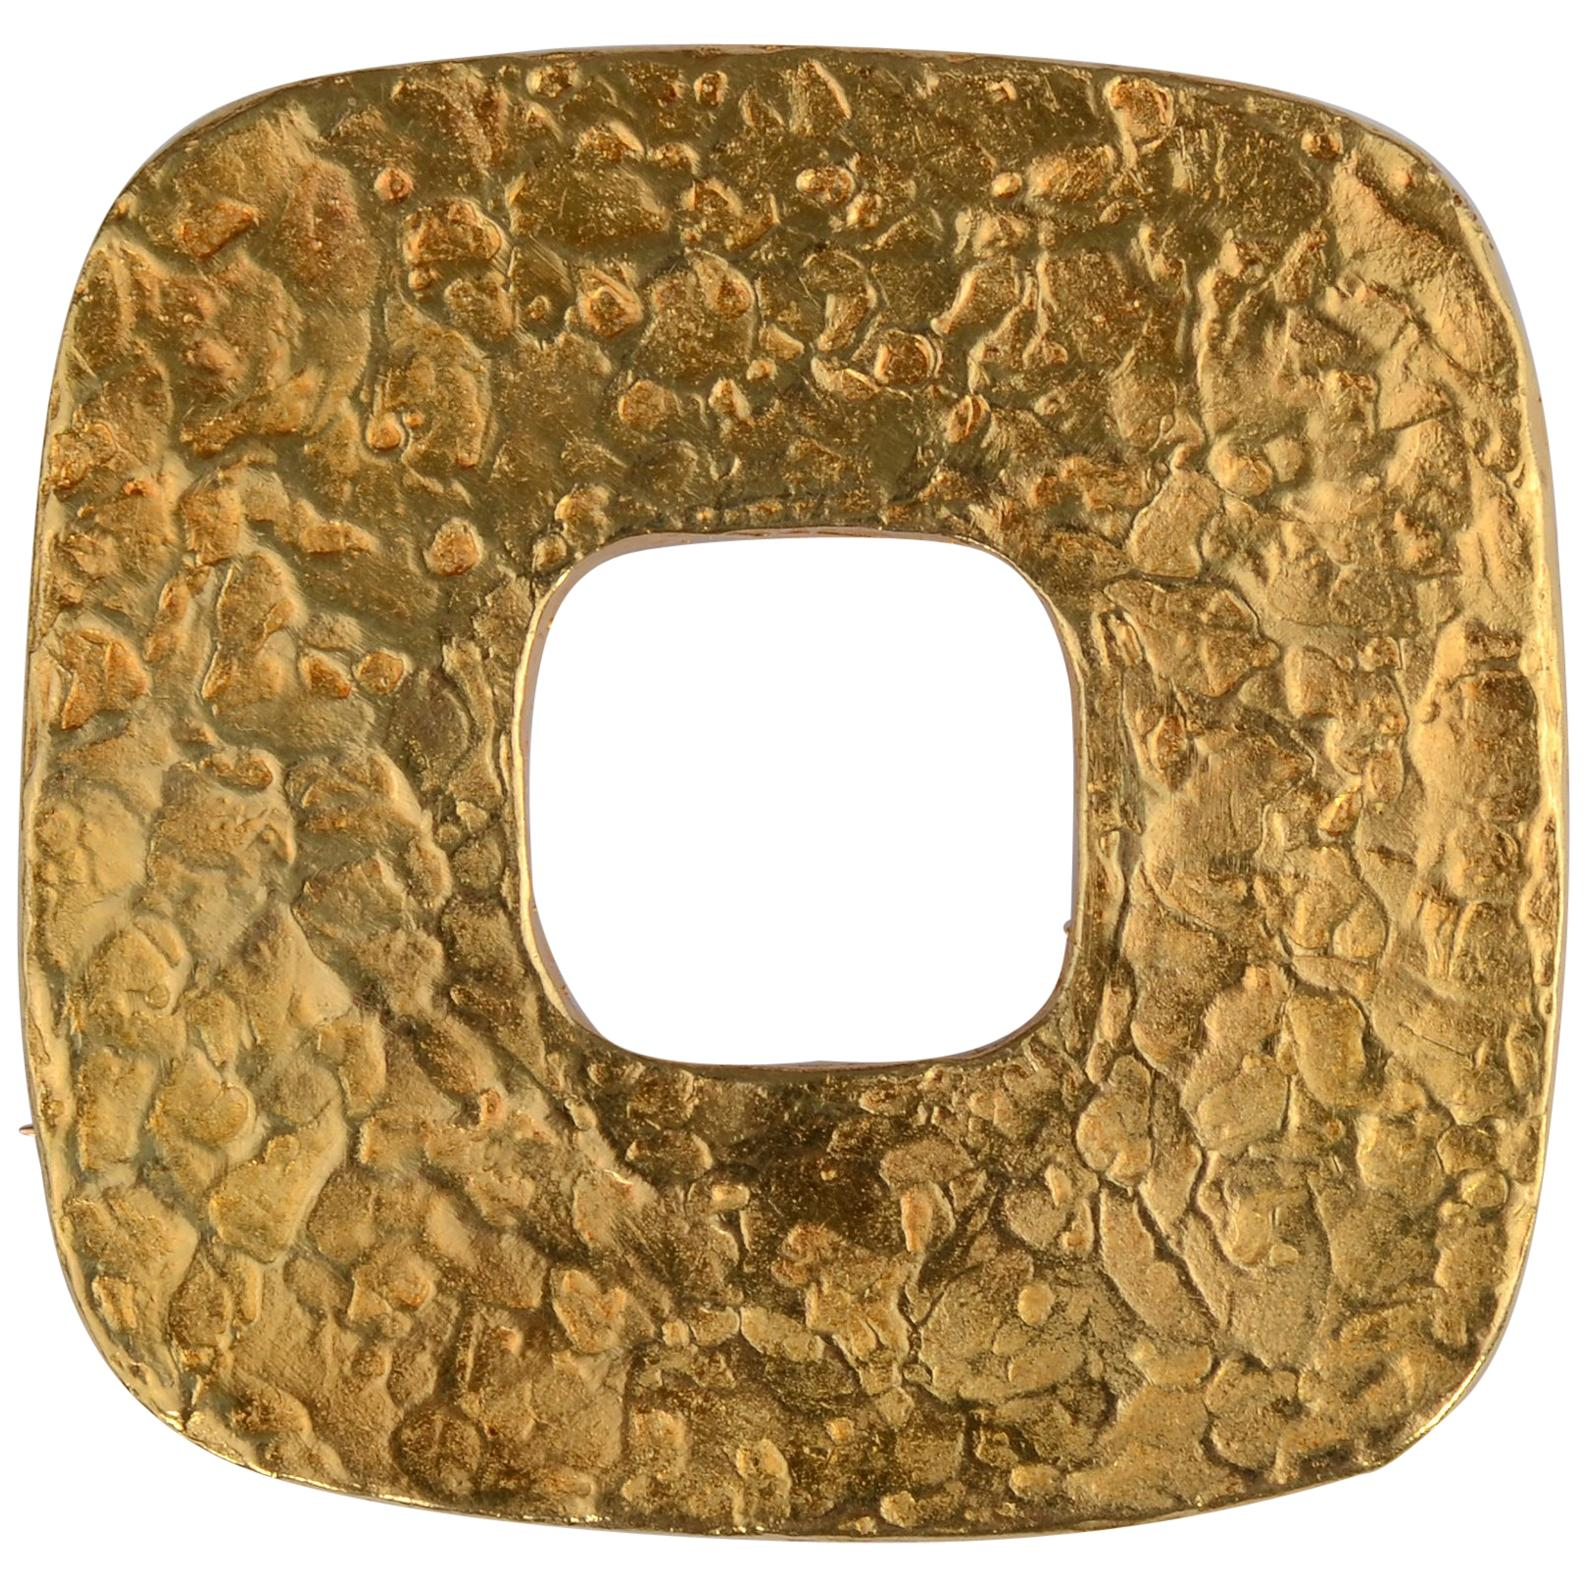 Ed Wiener Gold Pendant or Brooch